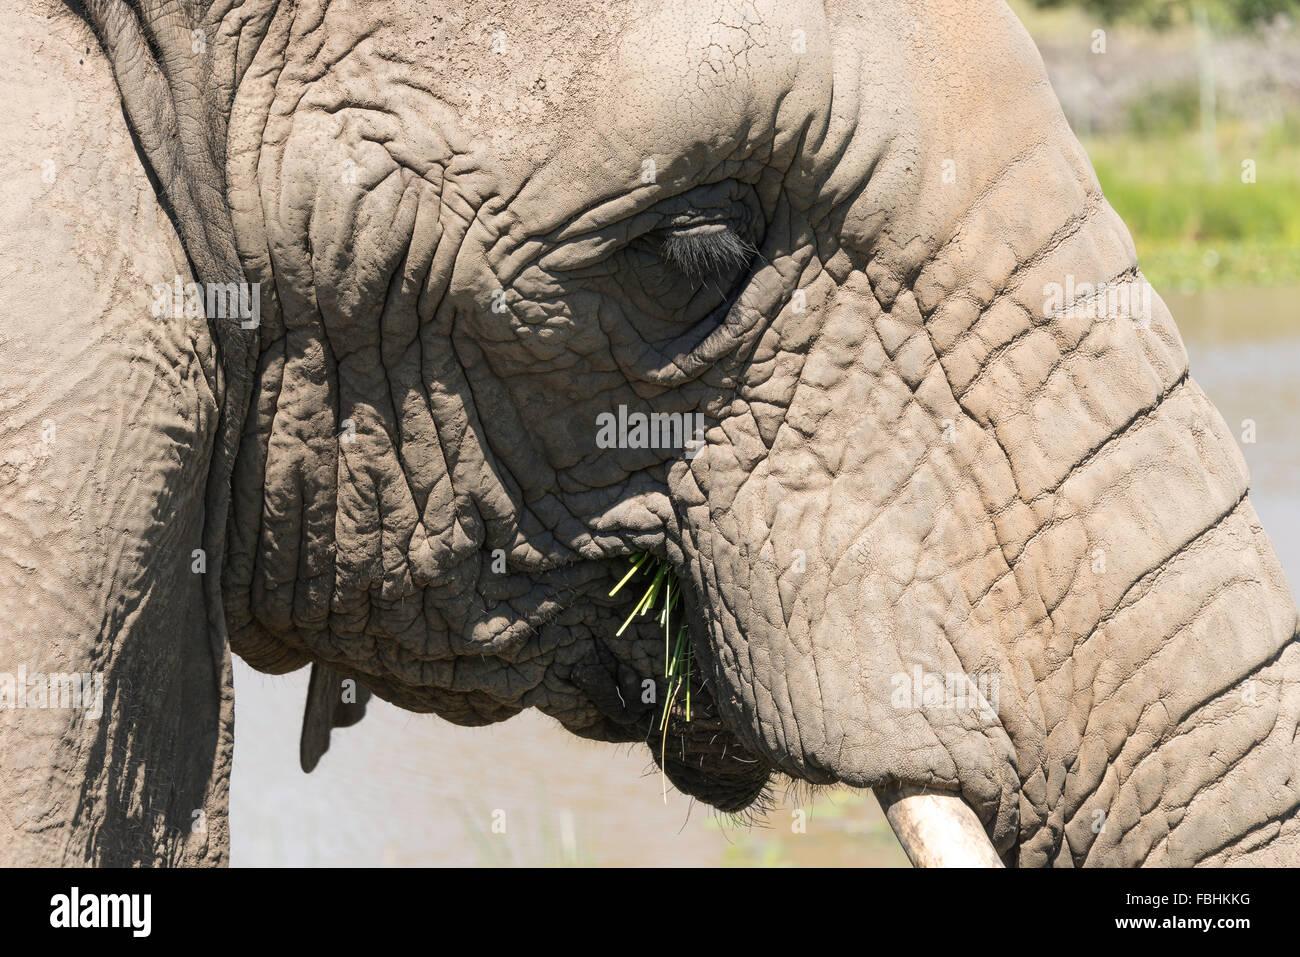 Elephant at Knysna Elephant Park, Plettenberg Bay, Knysna, Knysna Municipality, Western Cape Province, South Africa - Stock Image